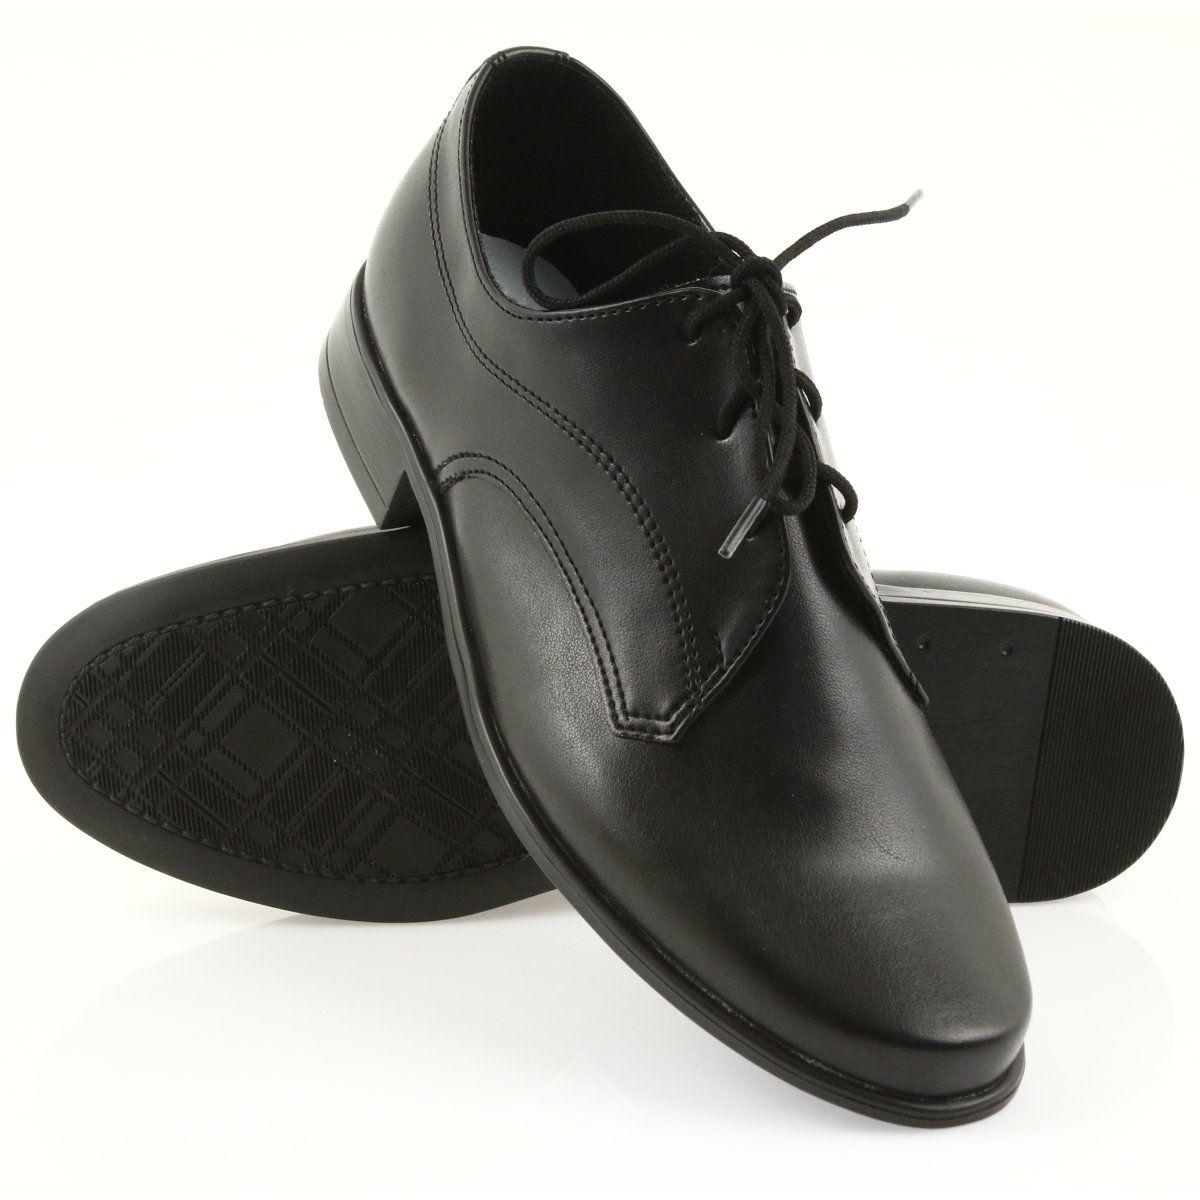 Miko Polbuty Dzieciece Buty Chlopiece Komunijne Czarne Childrens Shoes Boys Communion Shoes Childrens Shoes